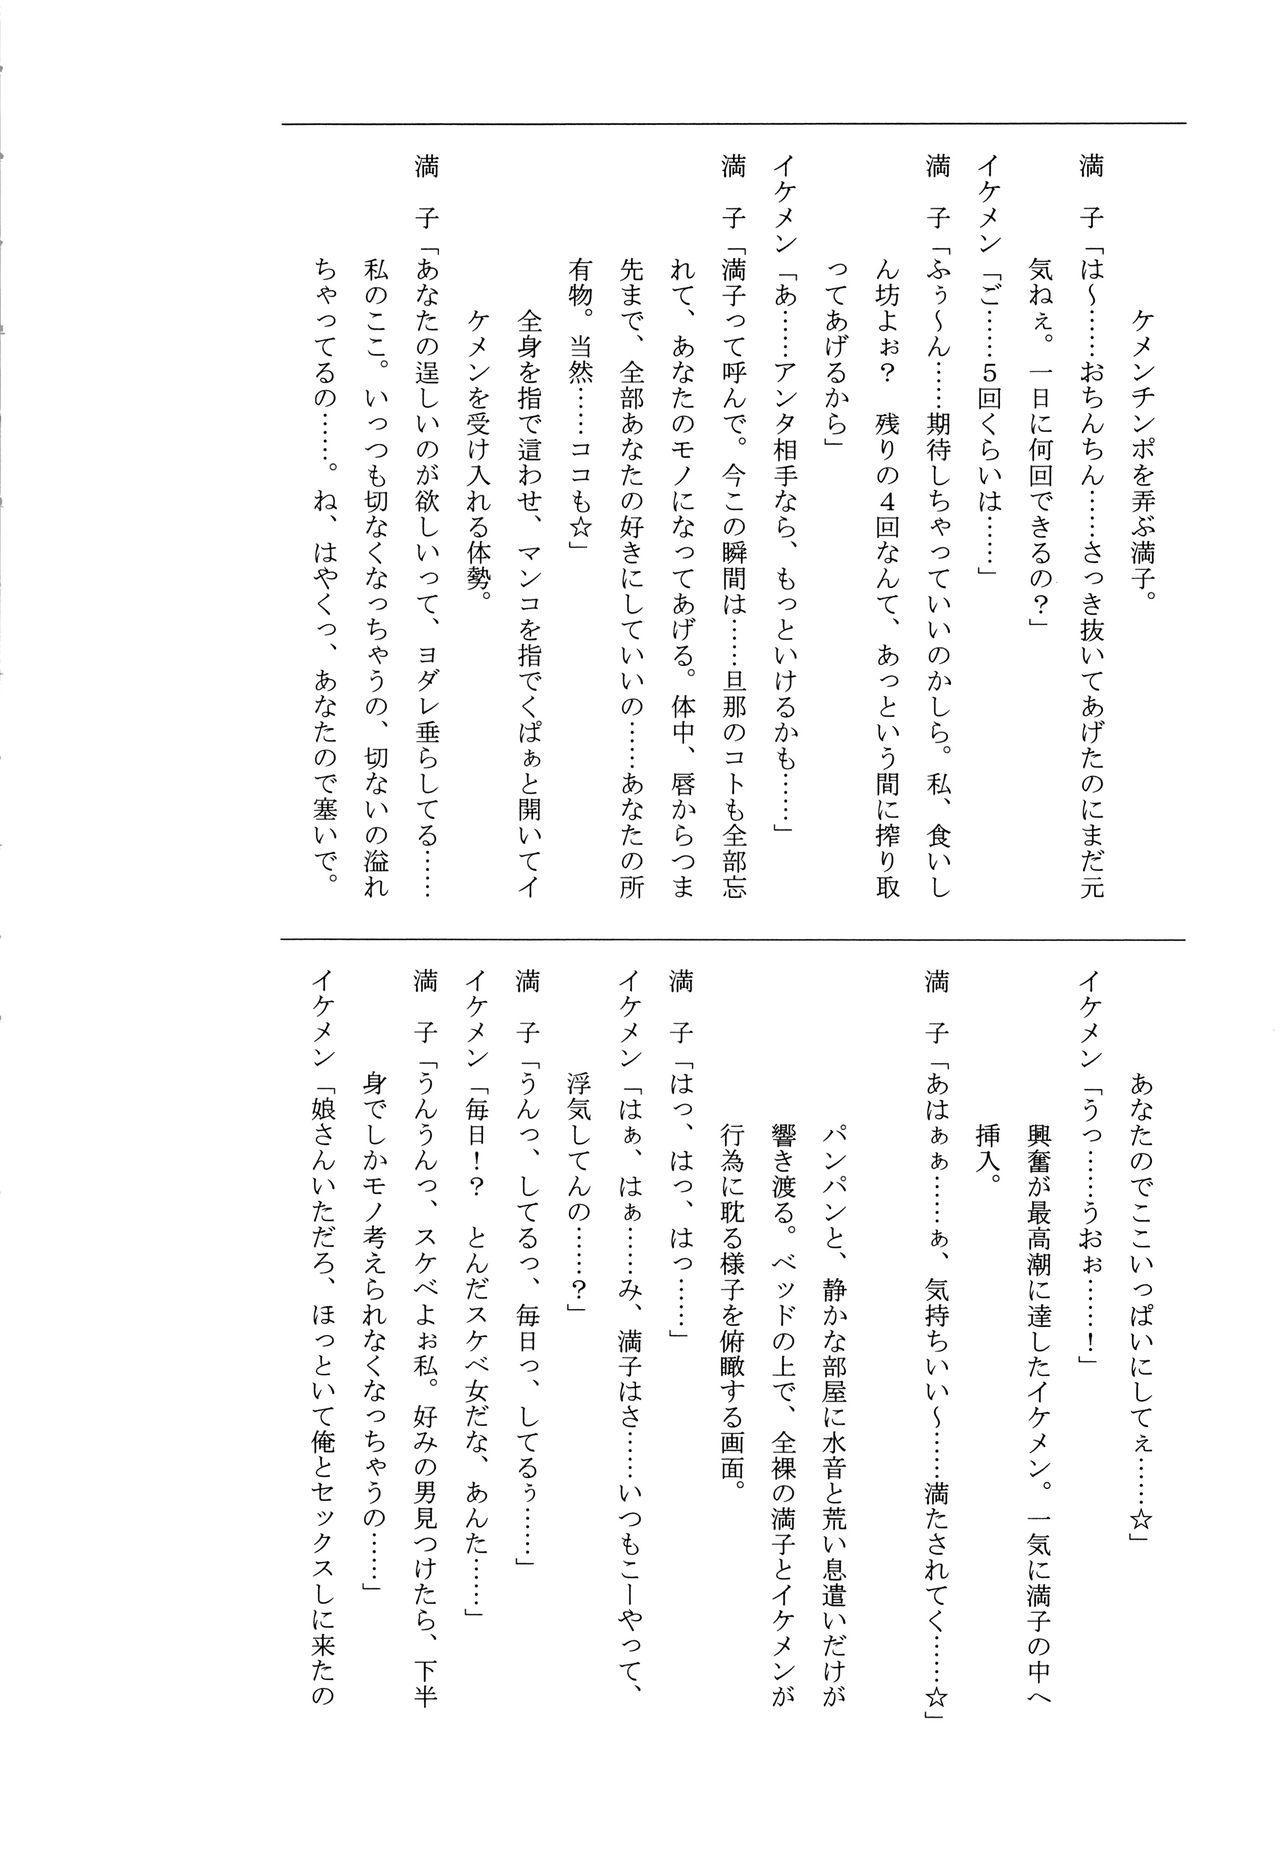 Teisou Kannen ZERO Shinsouban 1 191